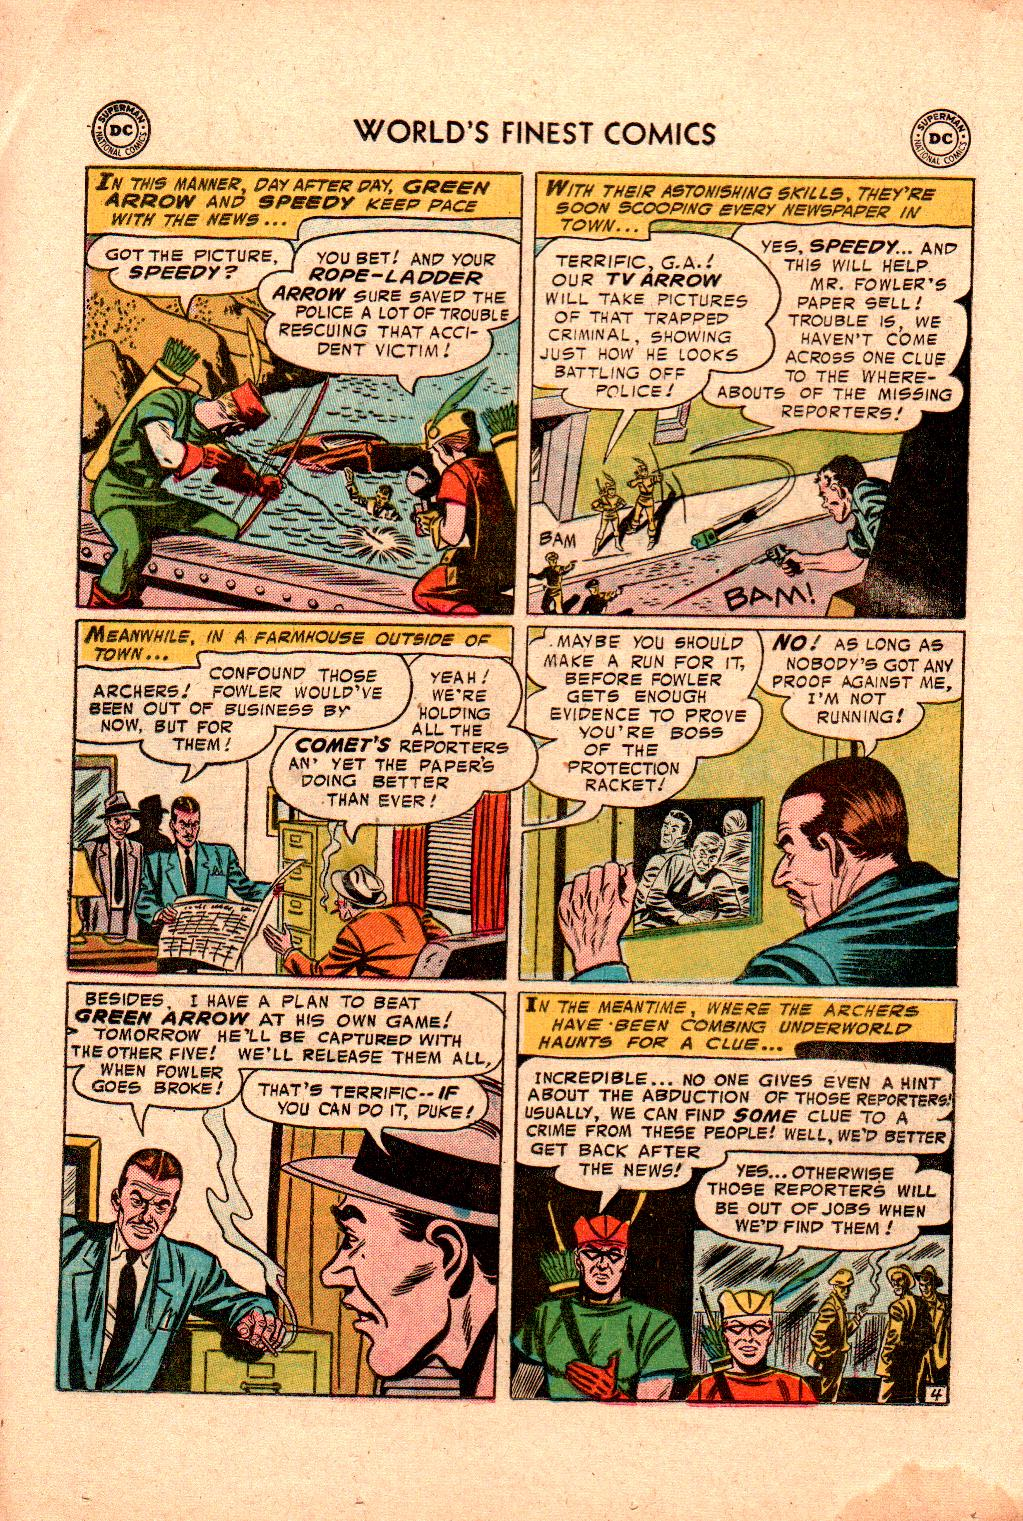 Read online World's Finest Comics comic -  Issue #78 - 20